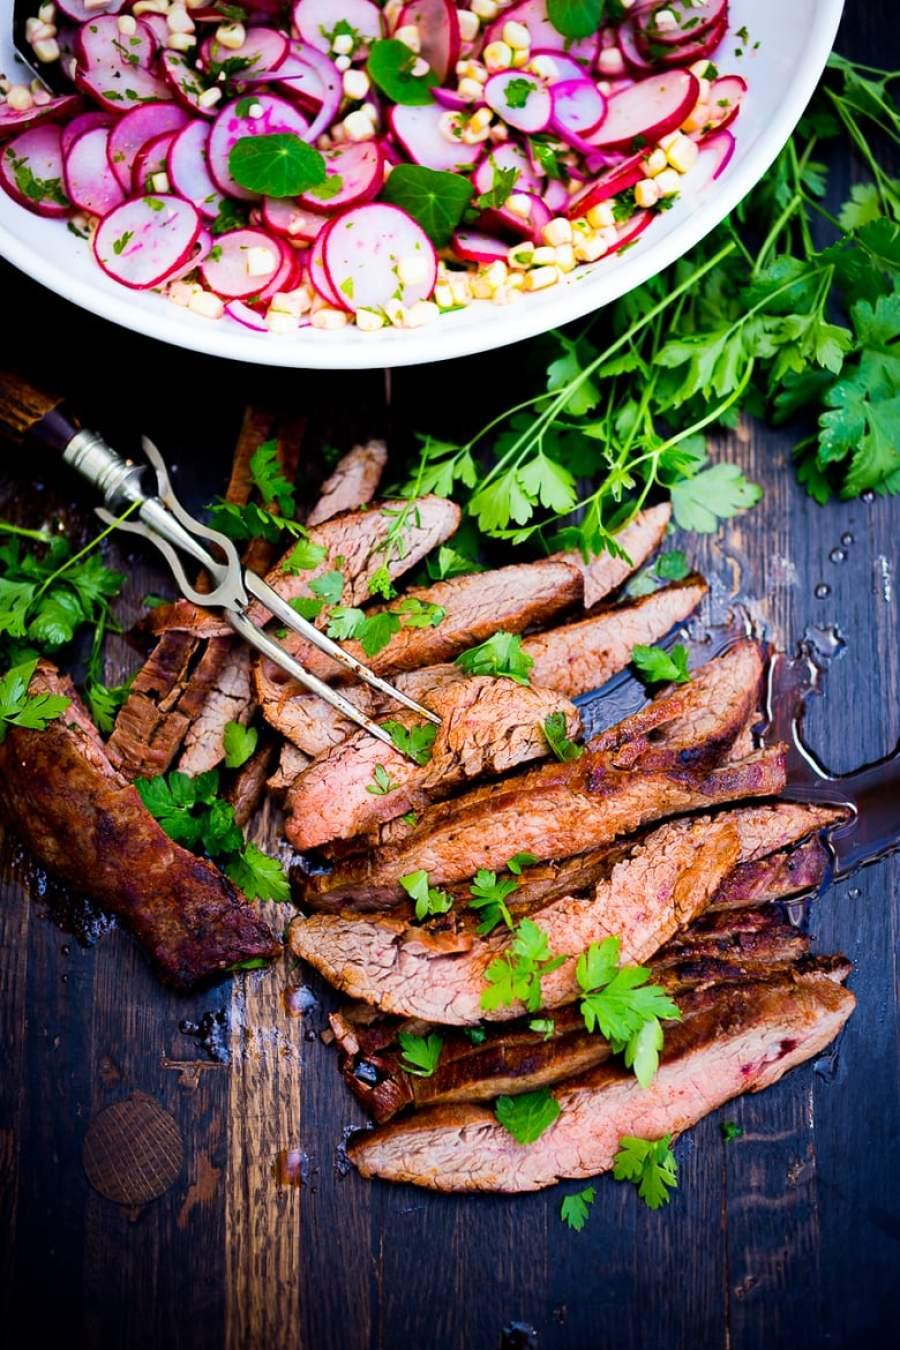 Grilled Flank Steak with Corn & Radish Salad